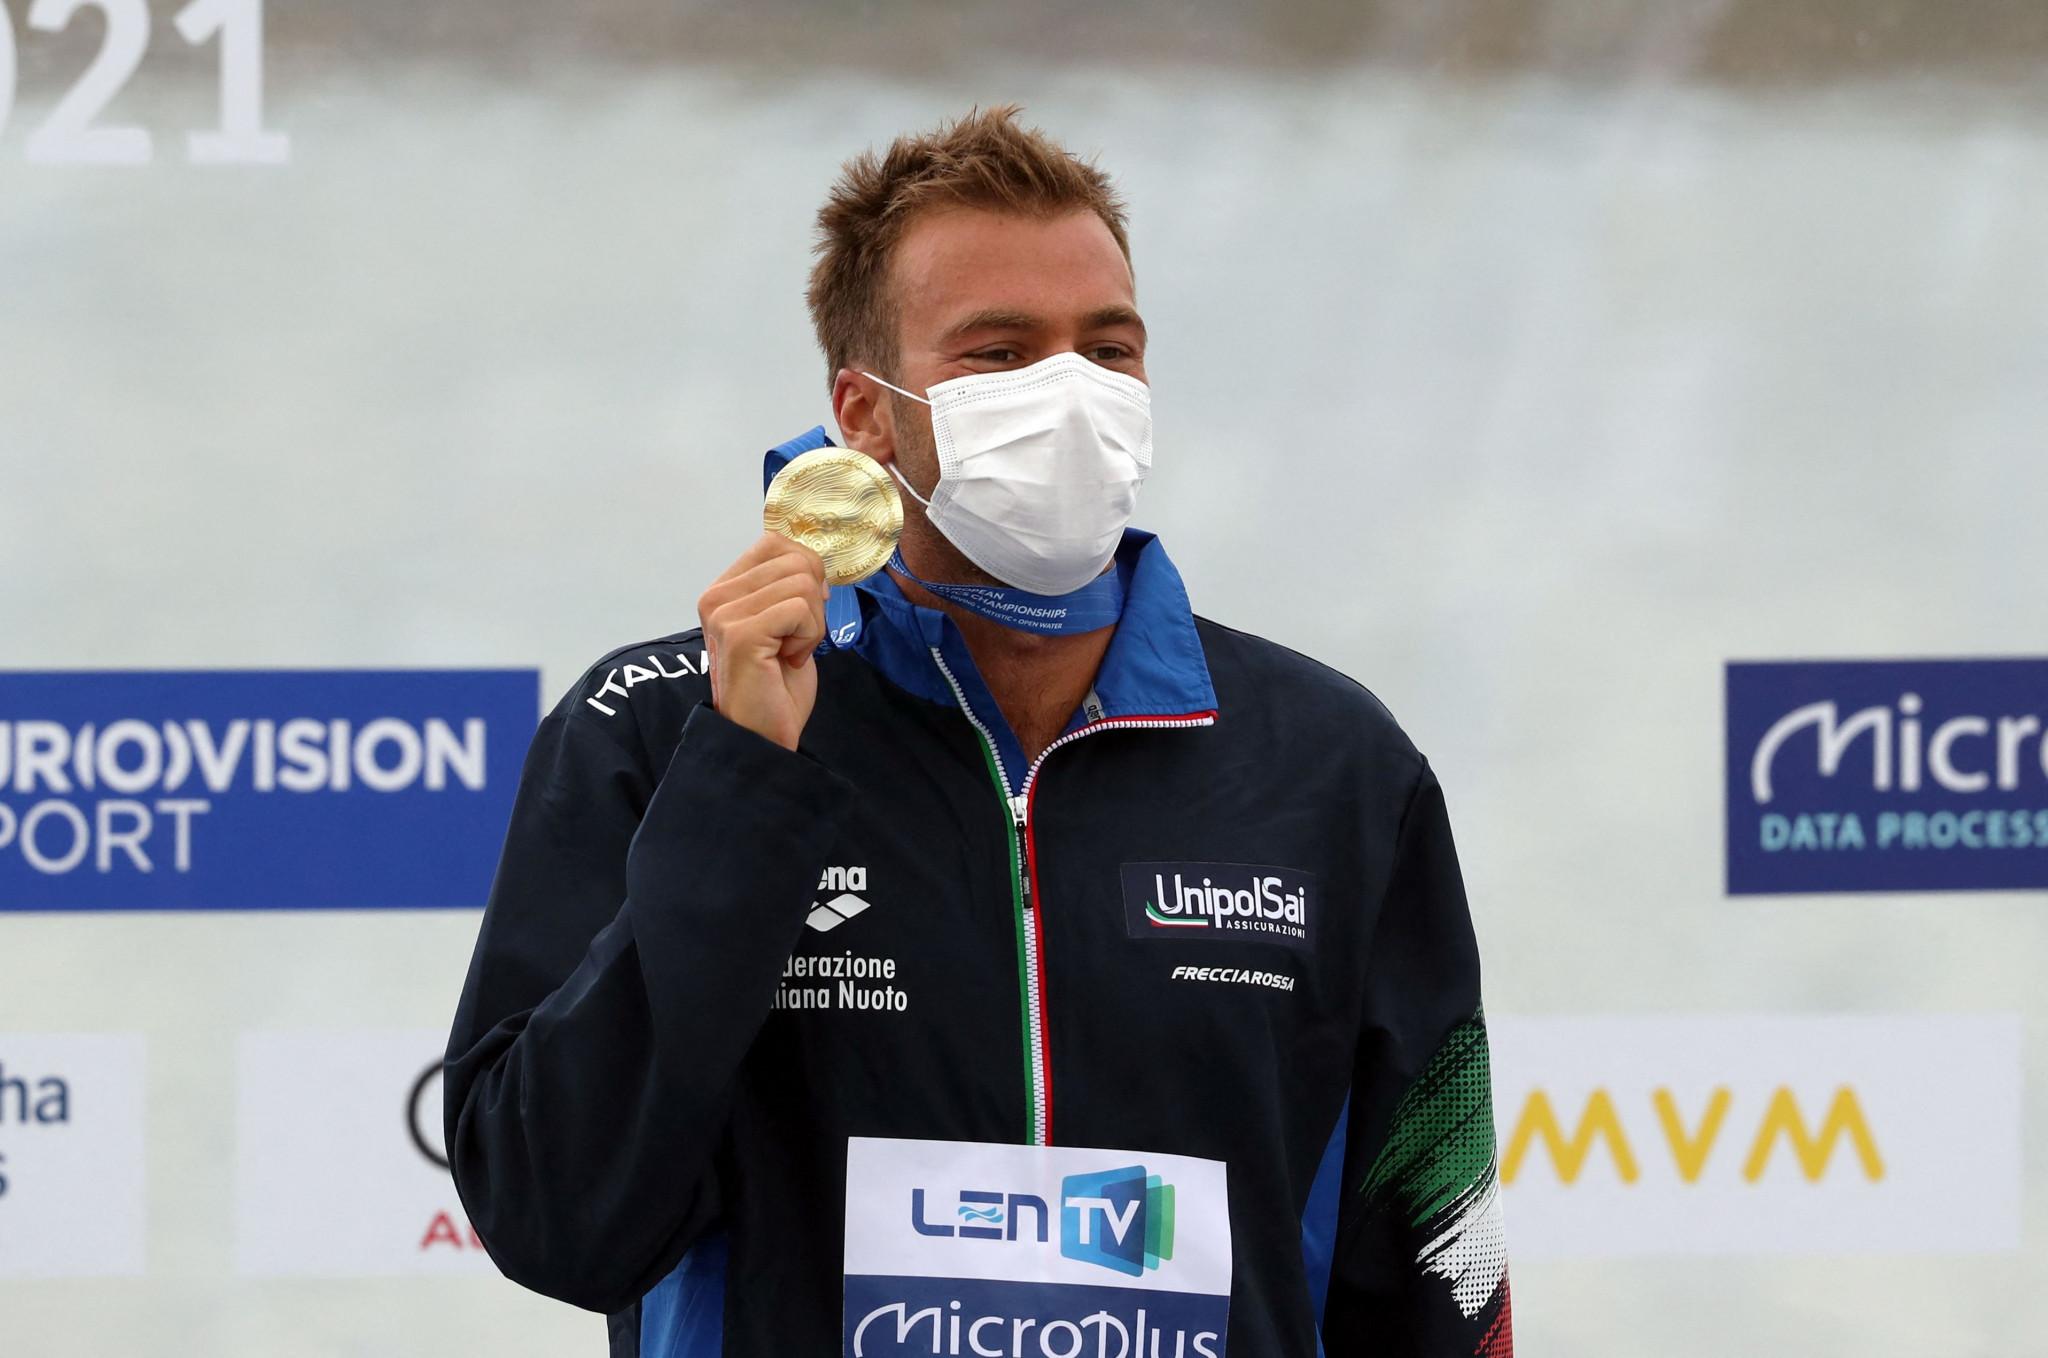 Paltrinieri leads Italian medal run at European Aquatics Championships